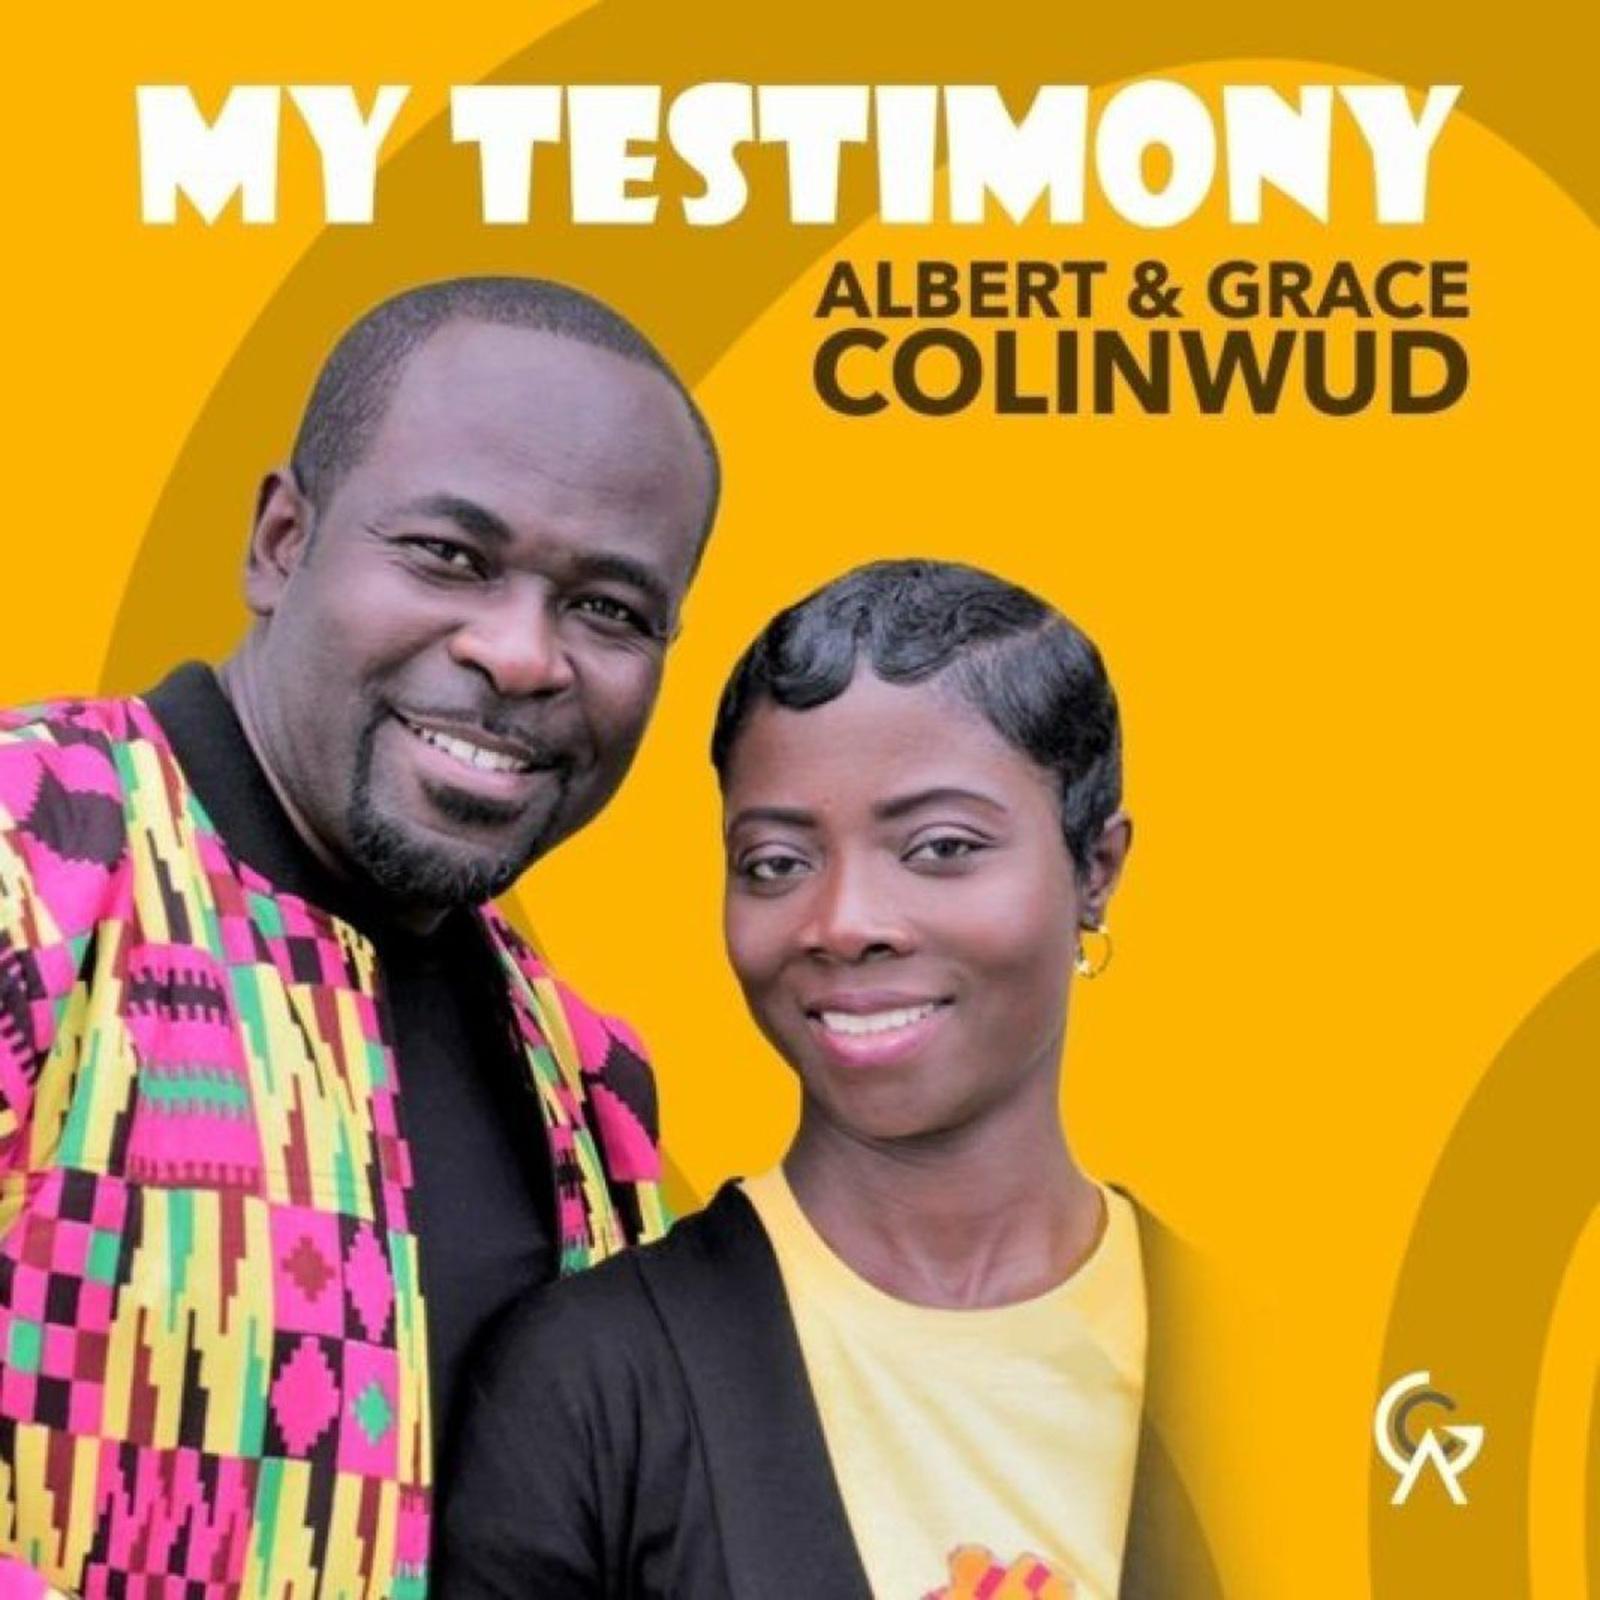 My Testimony by Albert & Grace Colinwud